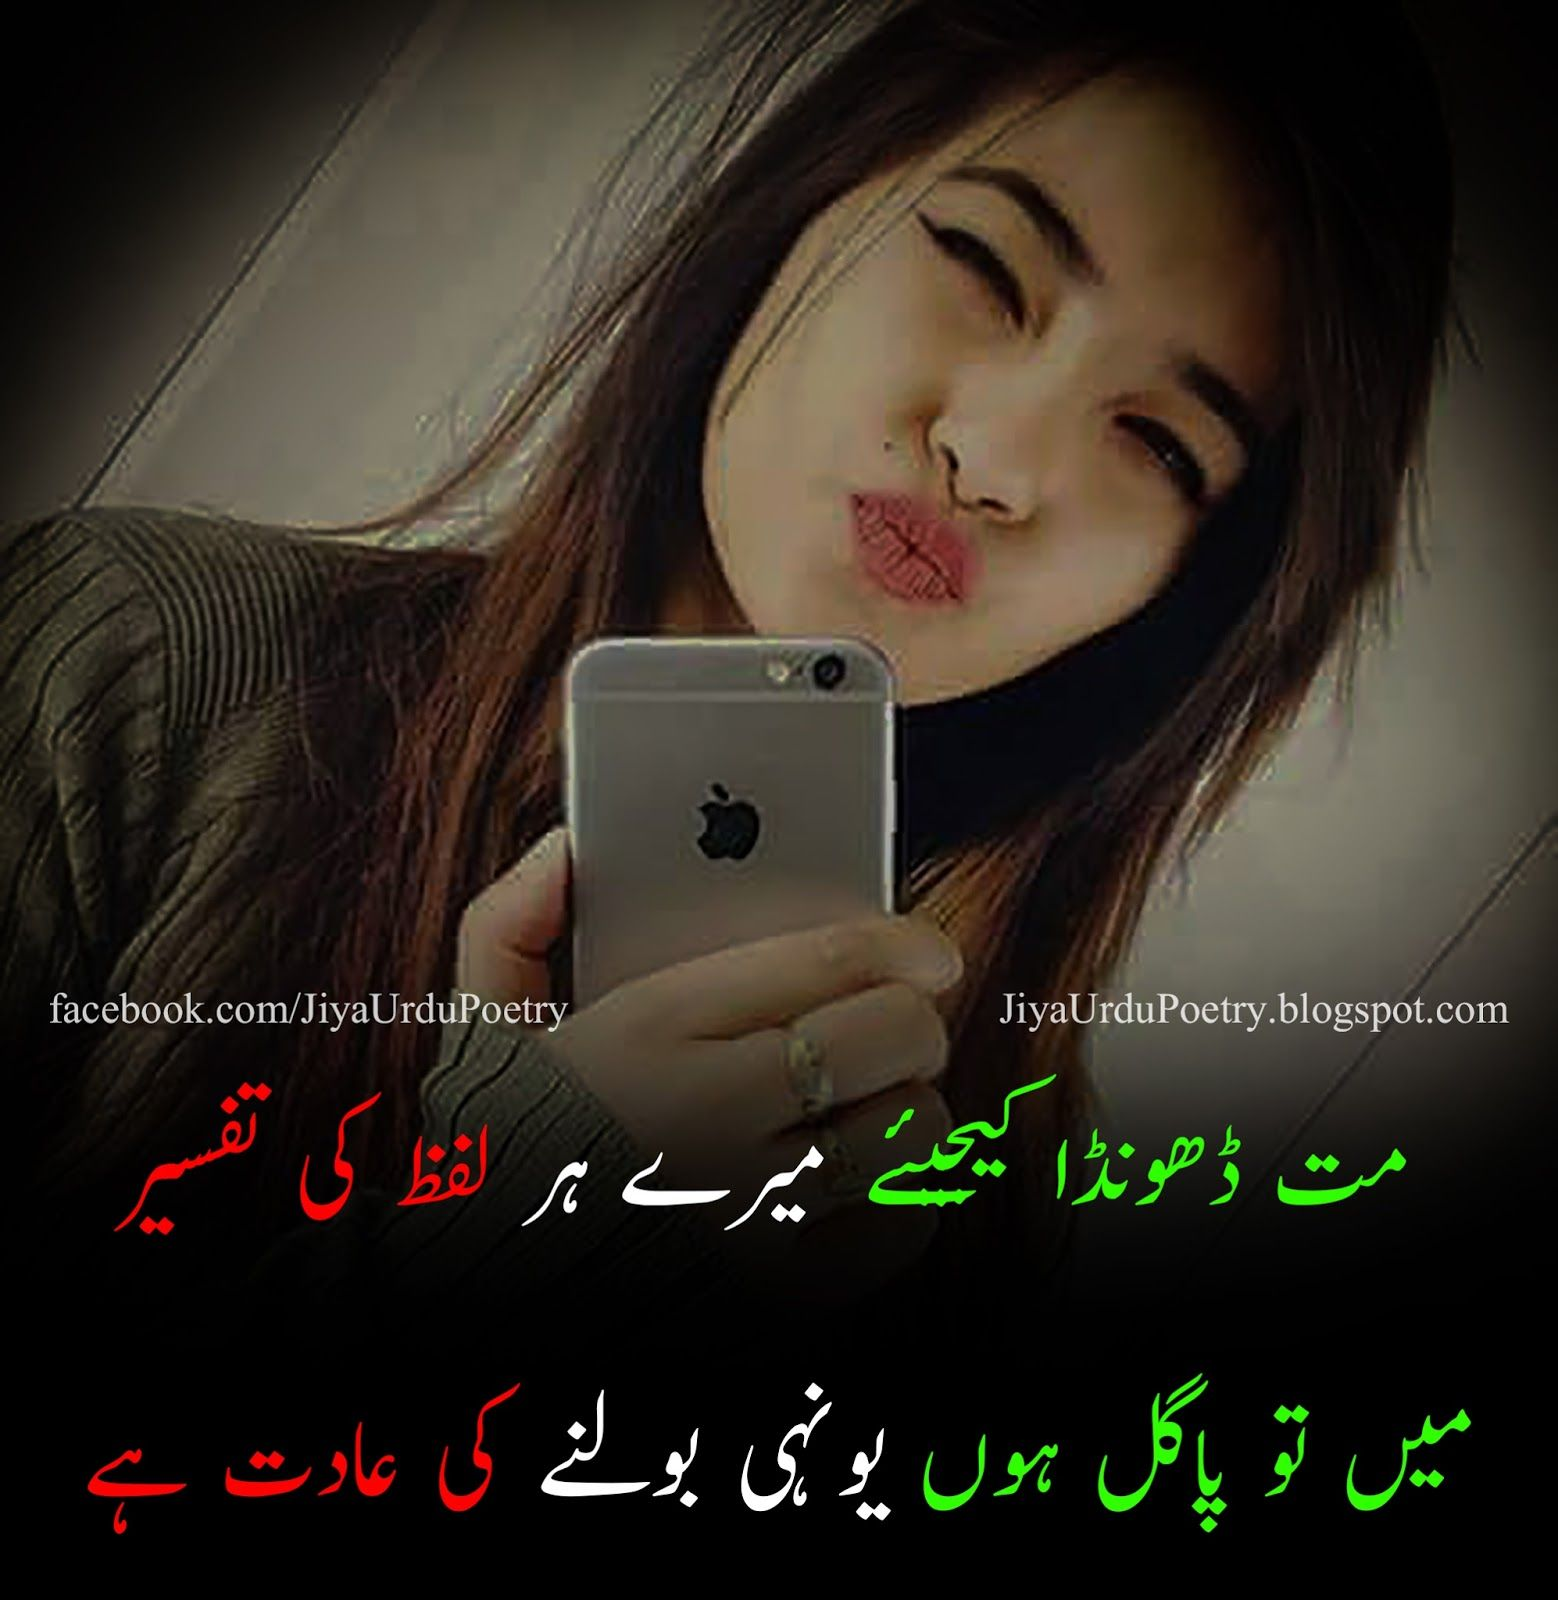 Latest Urdu Sad Poetry Shayari: Urdu Shayari Poetry Pics